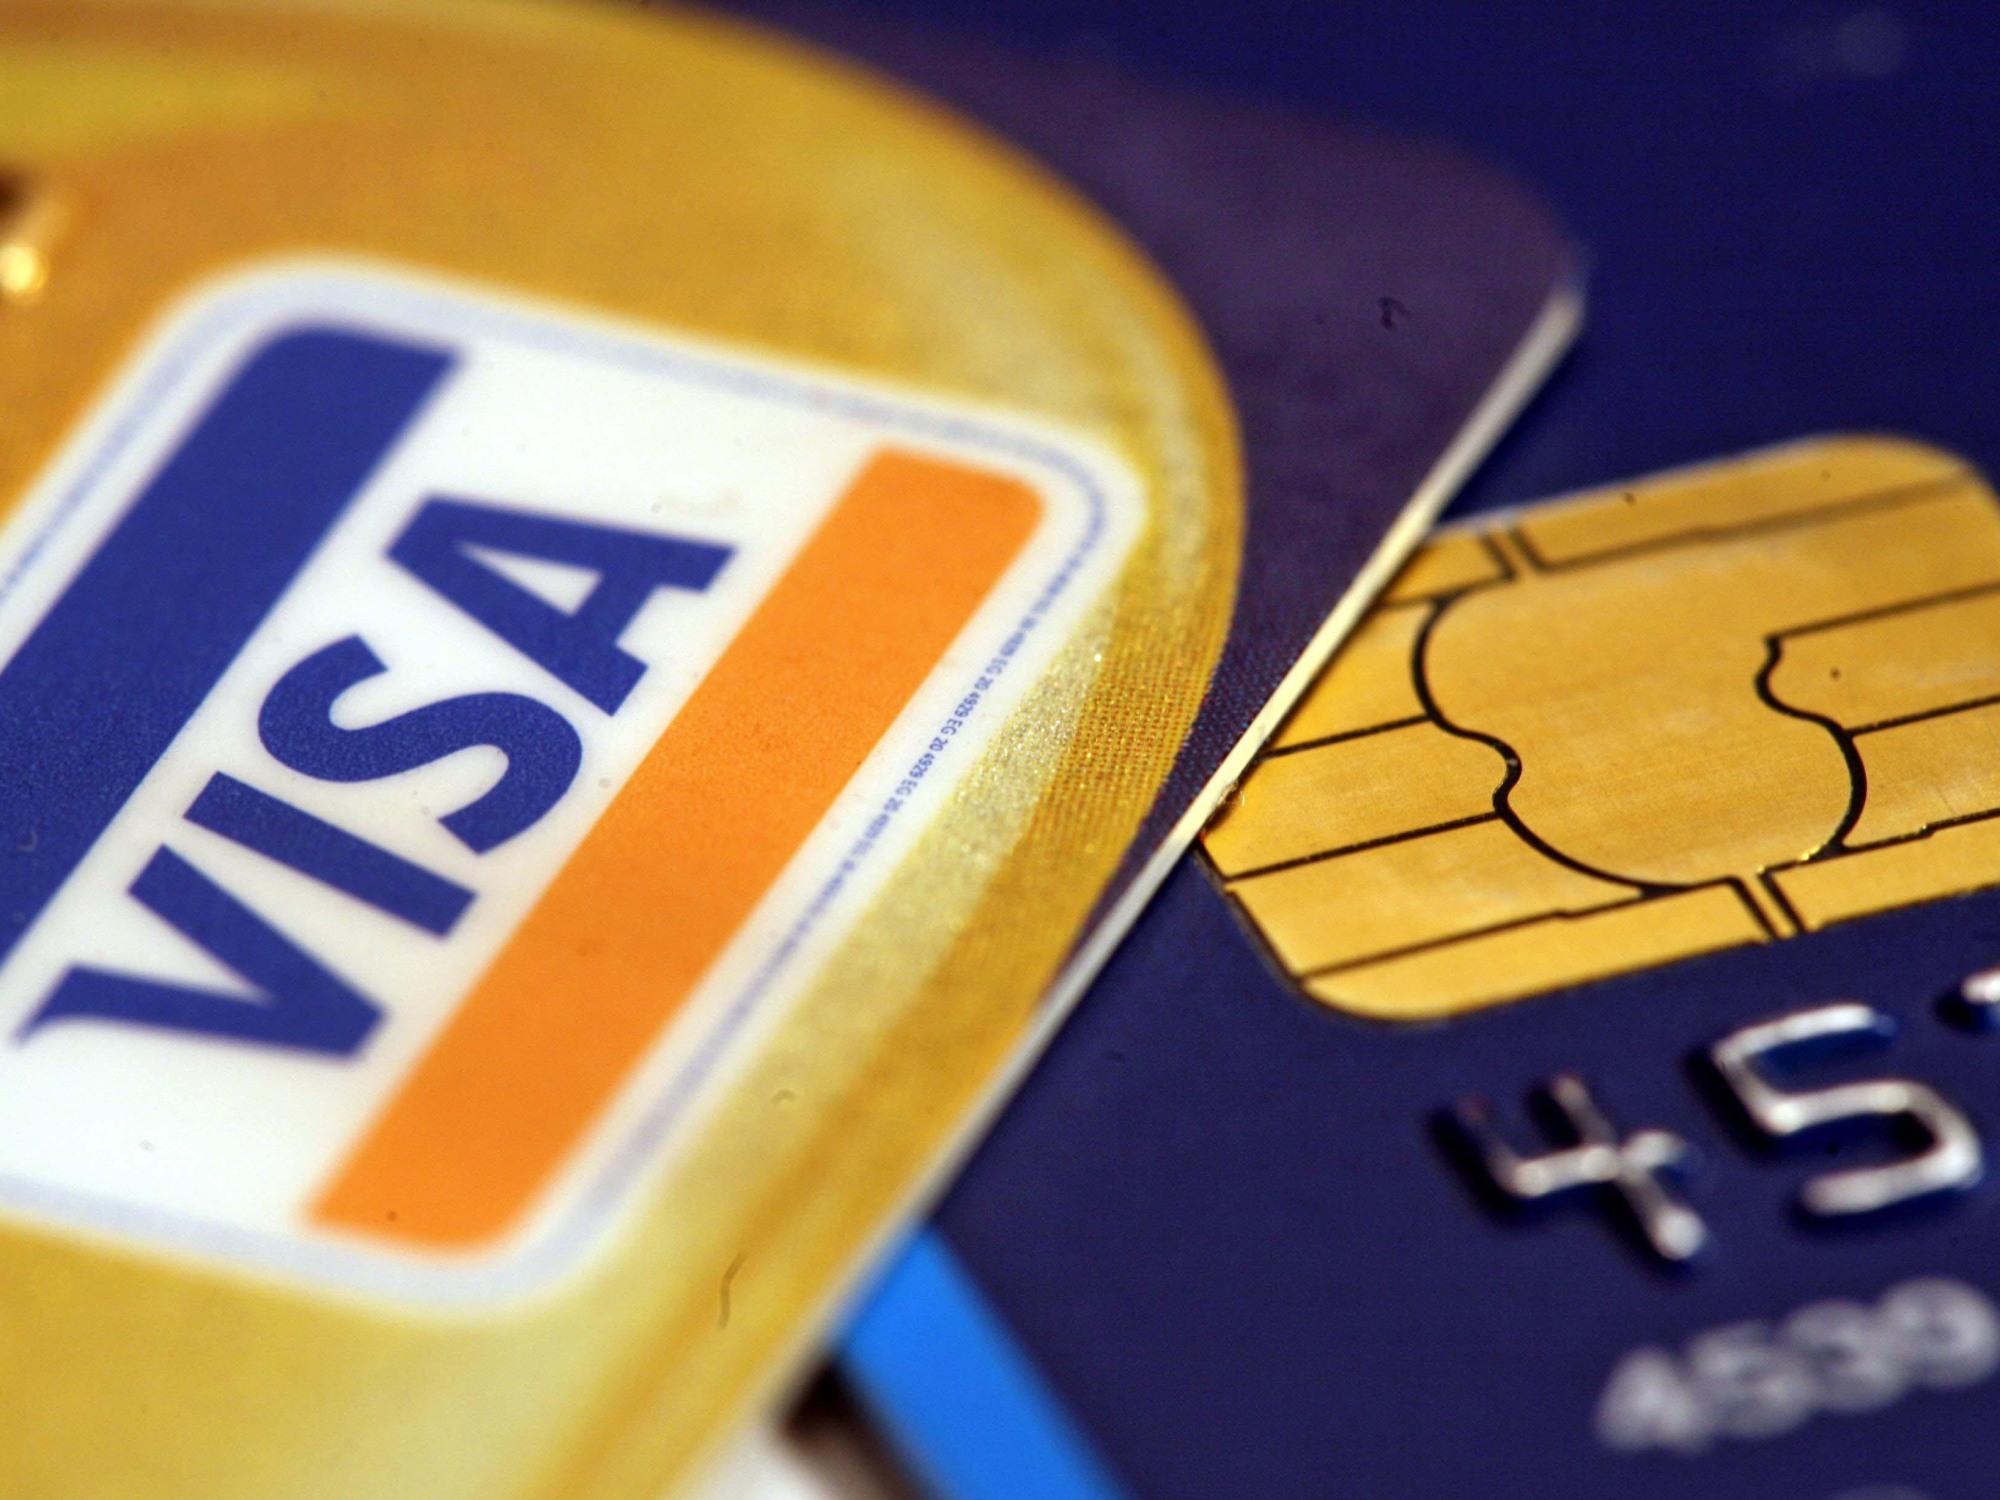 Critics-call-credit-card-chip-in-US-joke